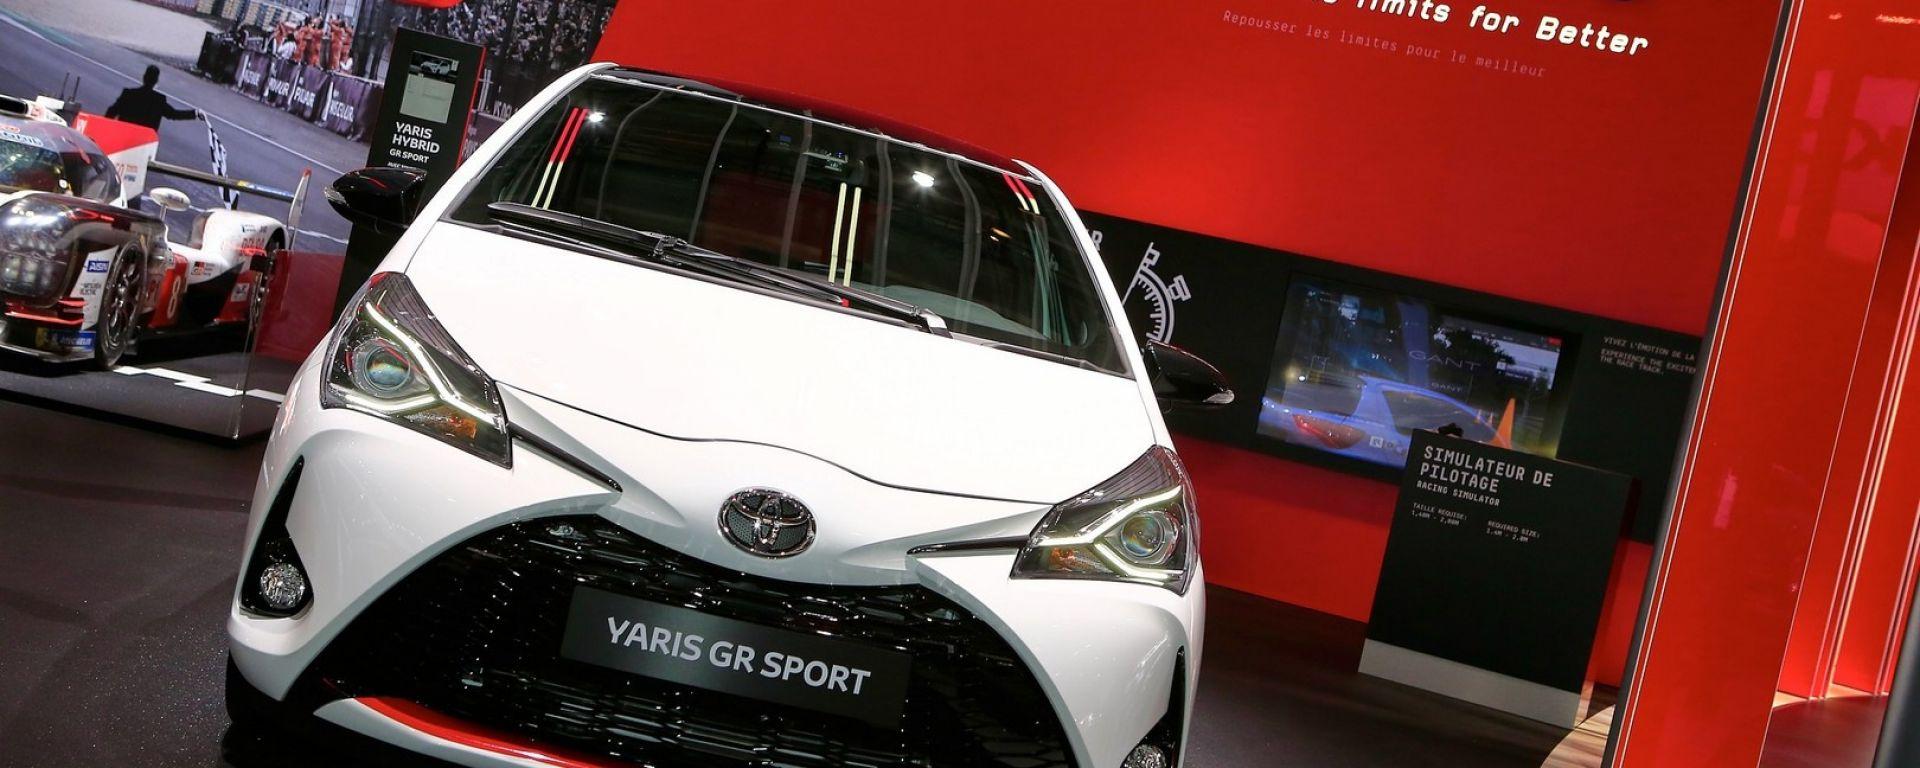 Toyota Yaris GR Sport, divertimento in salsa ibrida a Parigi